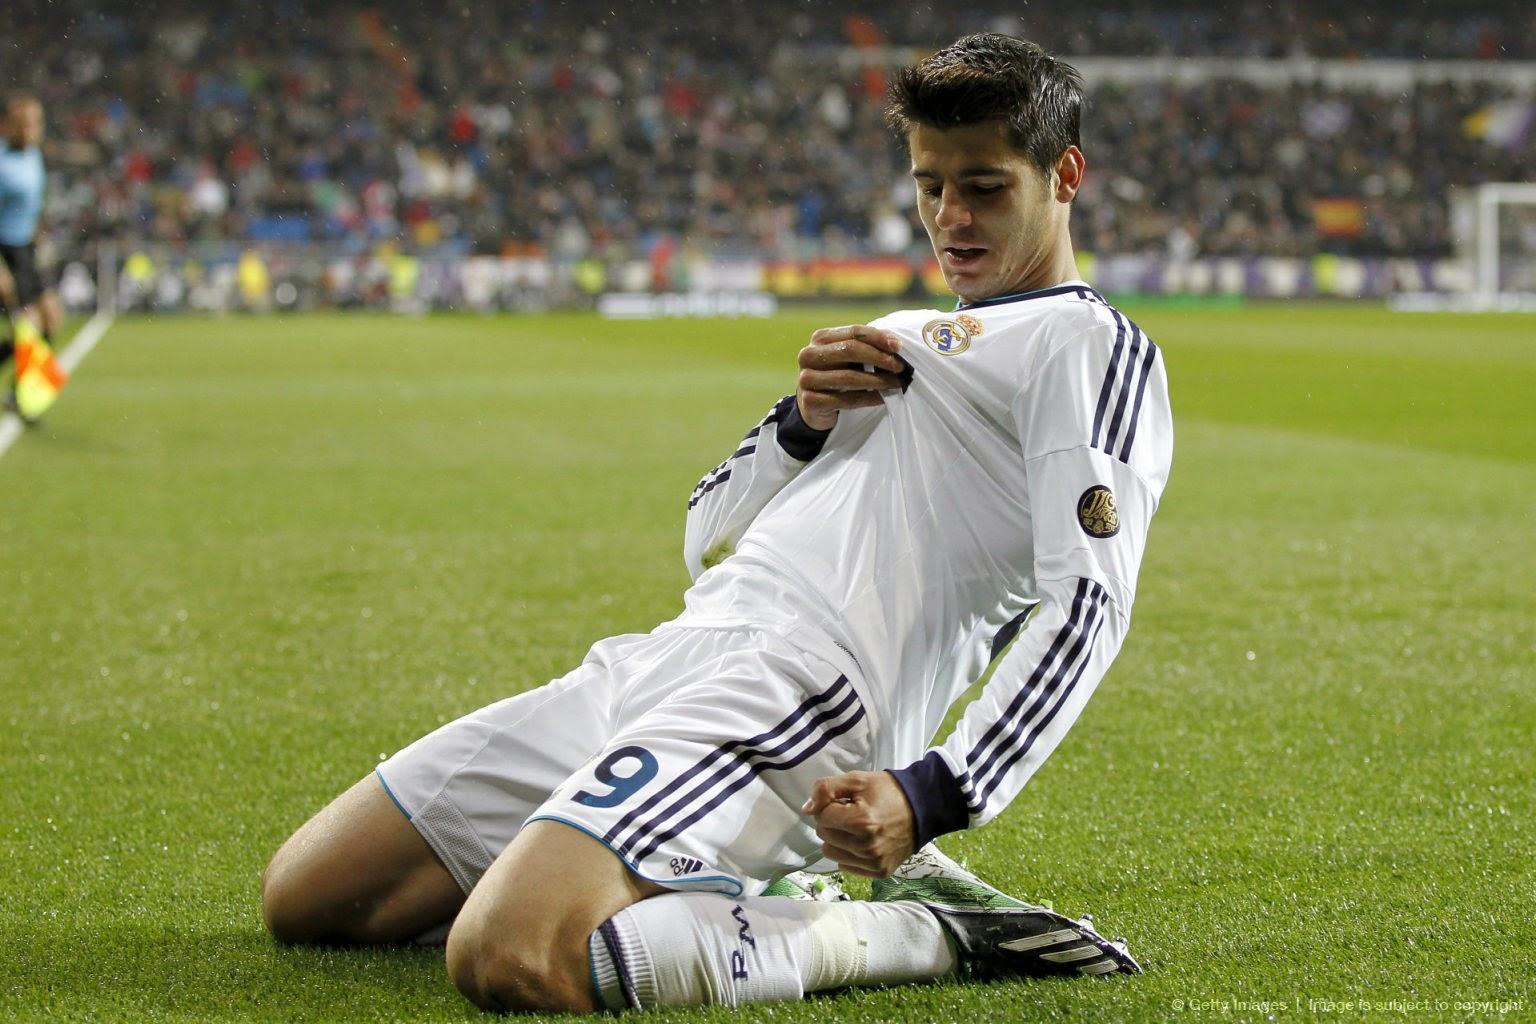 Morata (3-1) 18/03/14 - Champions League 13/14